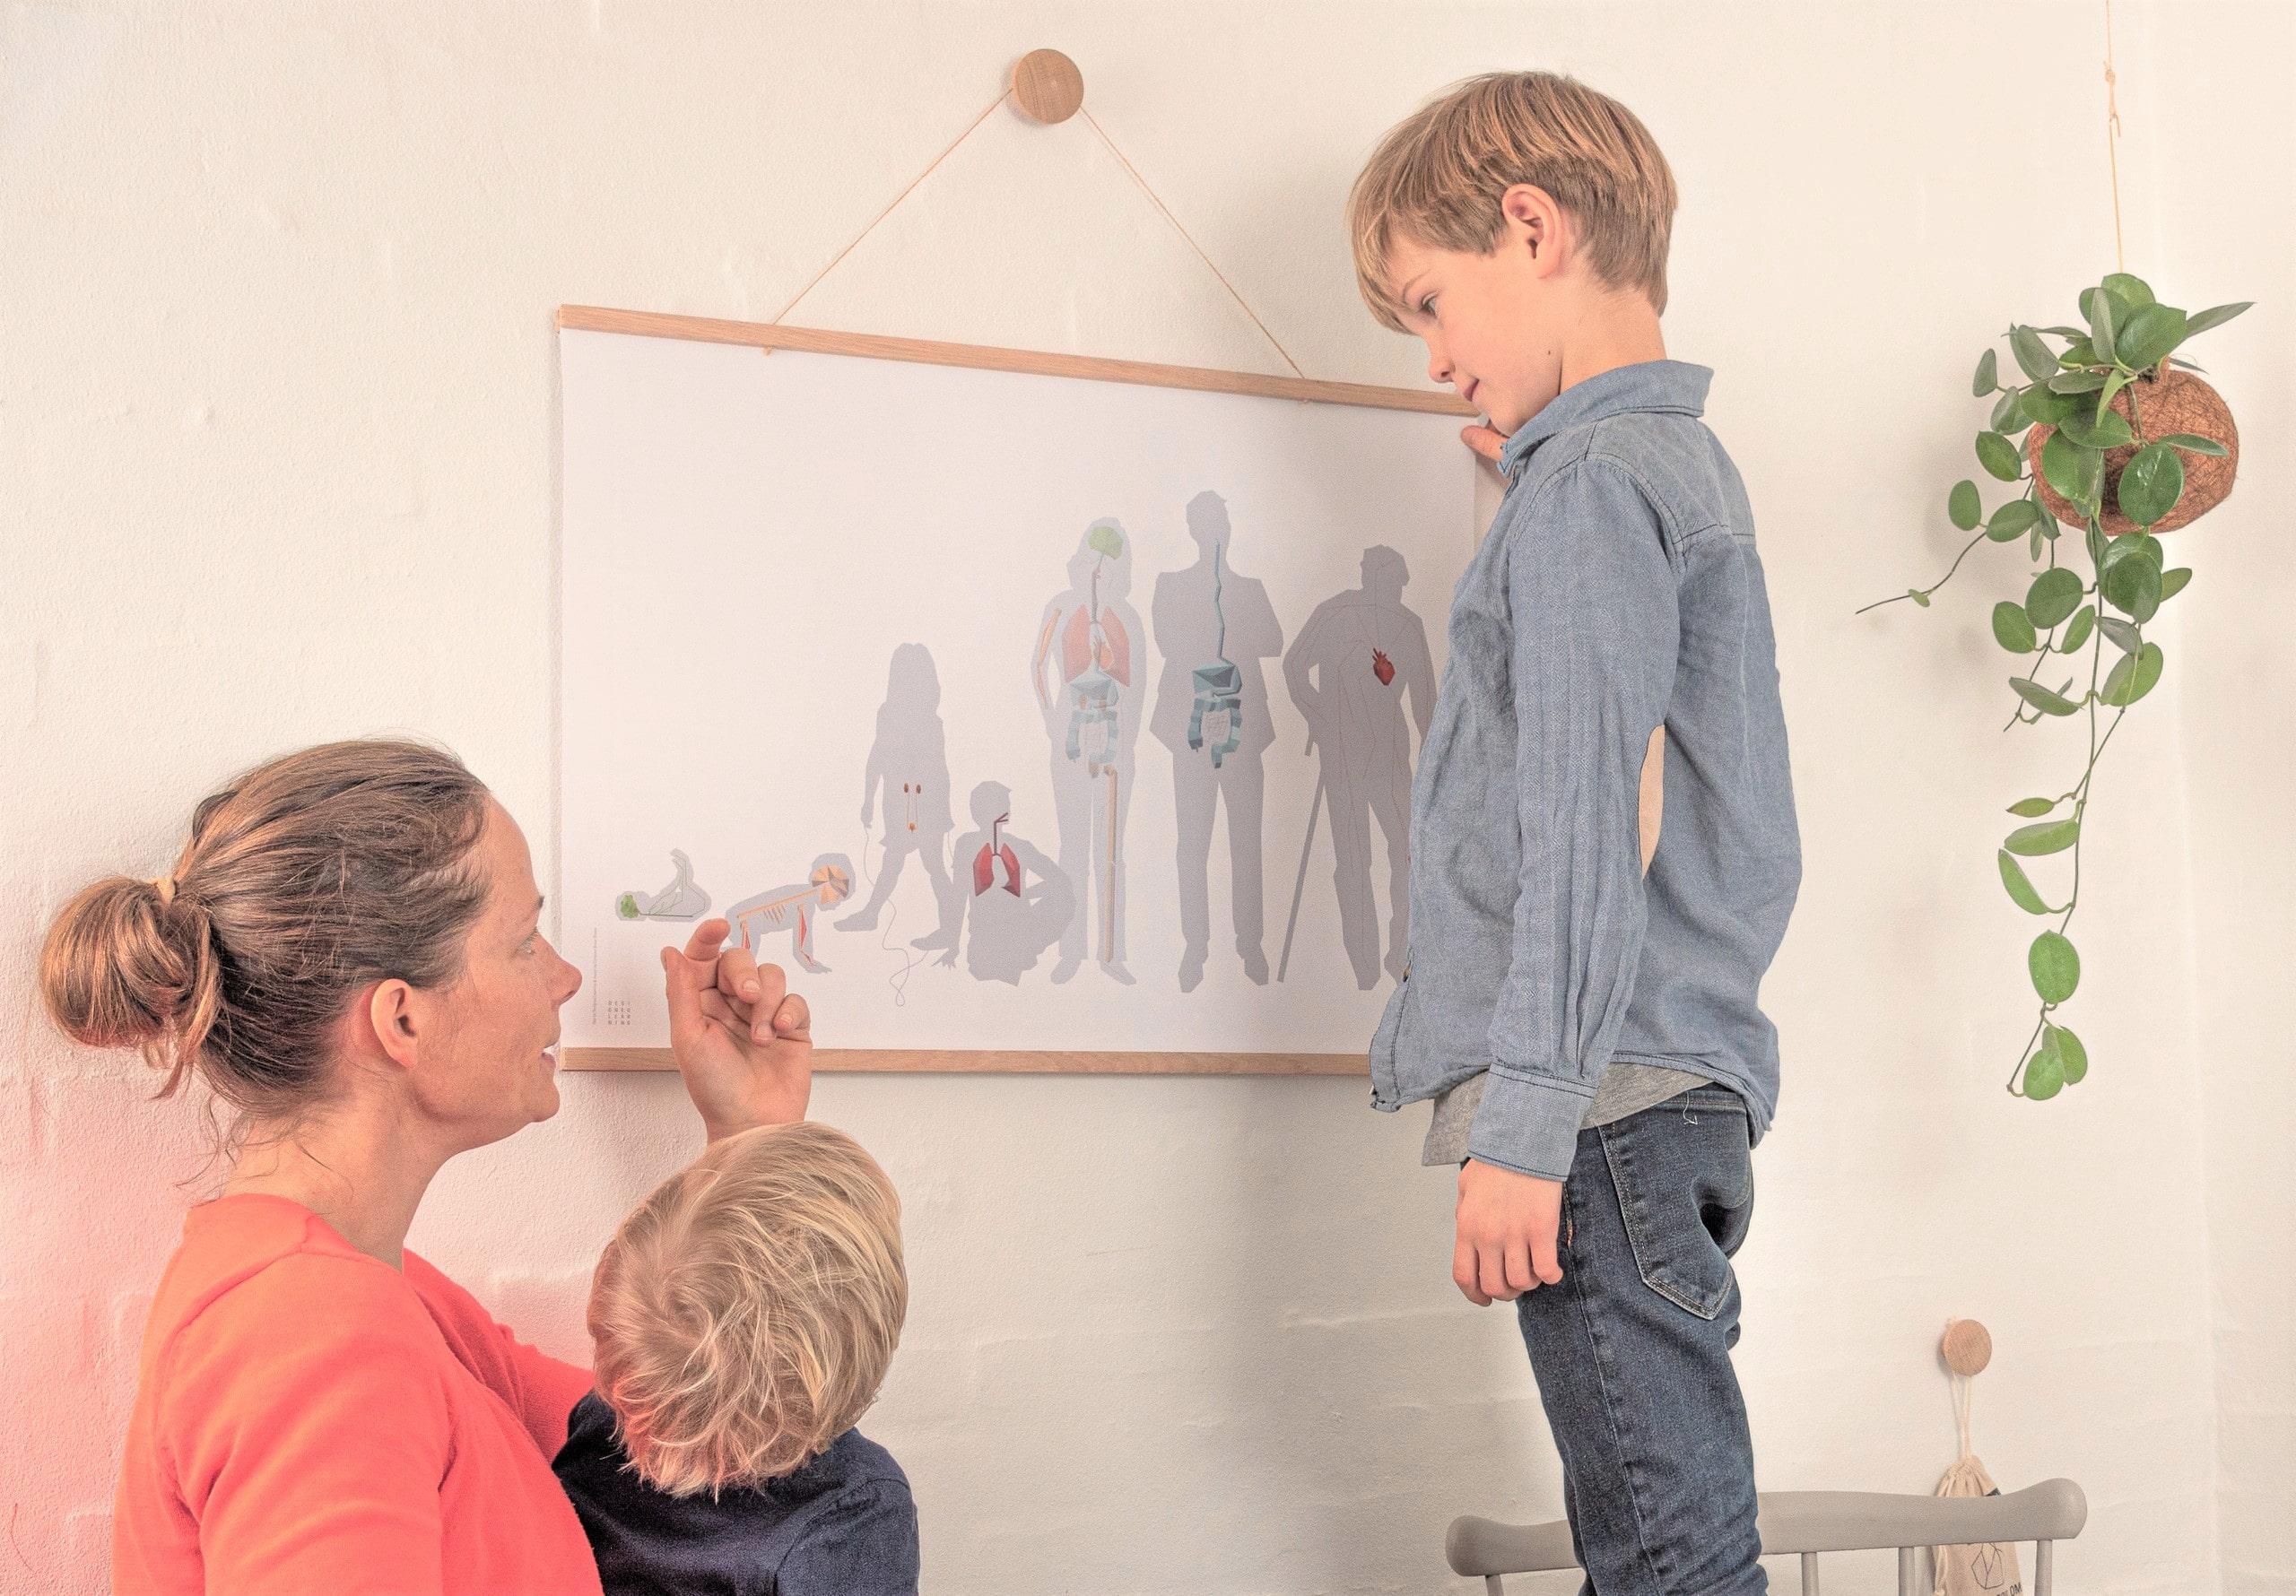 kropsplakat, nærvær, familie, læring